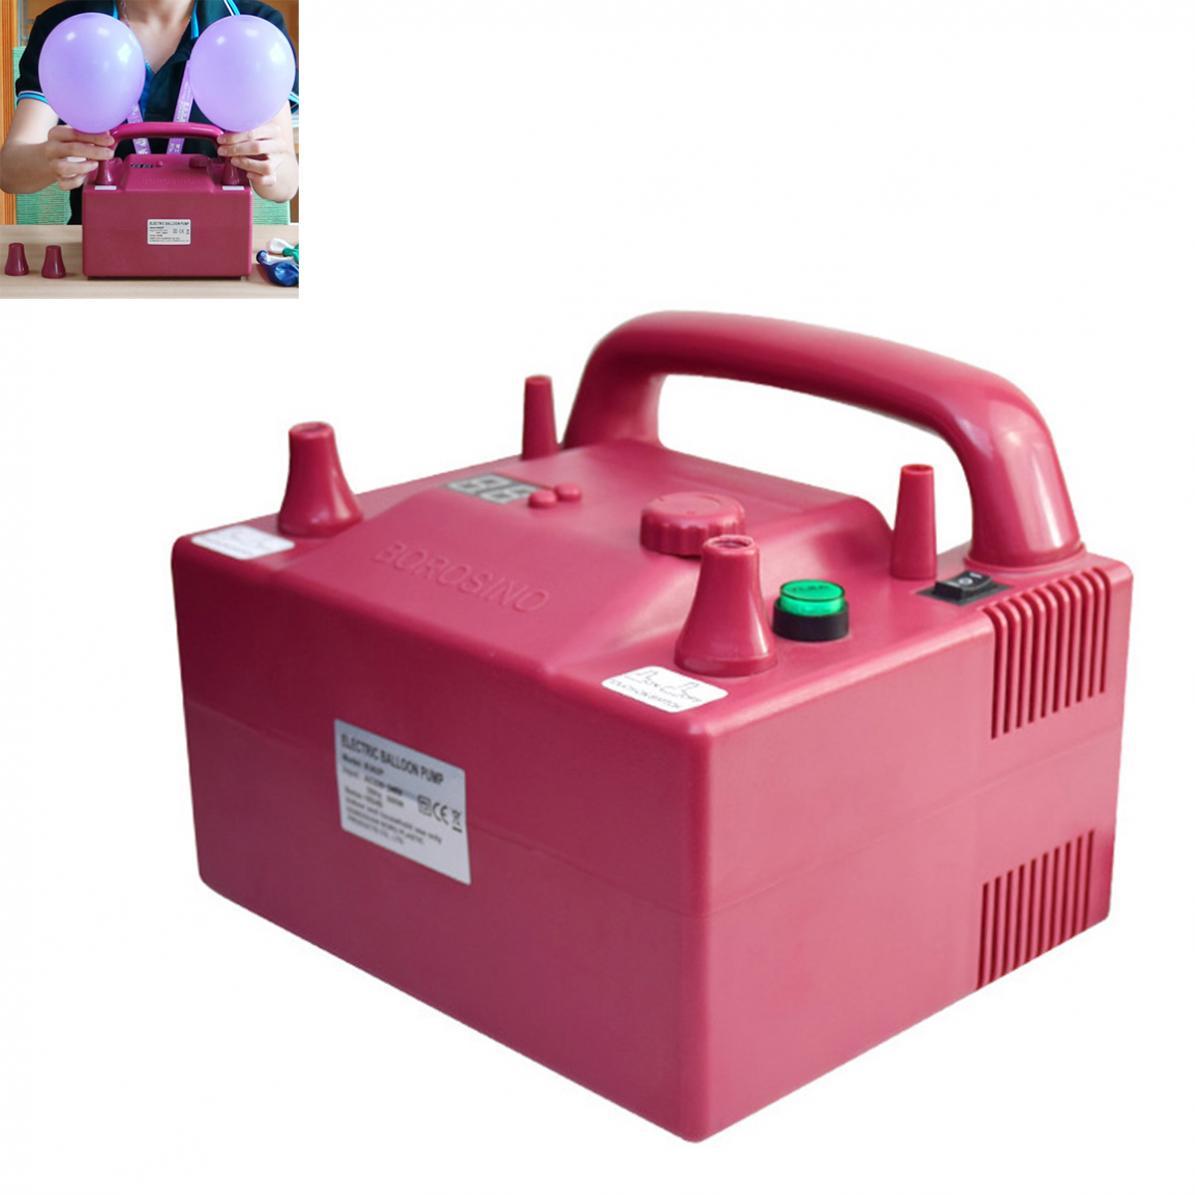 BOROSINO 800W B362P Timing Quantitative Multifunctional Electric Balloon Pump with 2 Inflation Nozzles